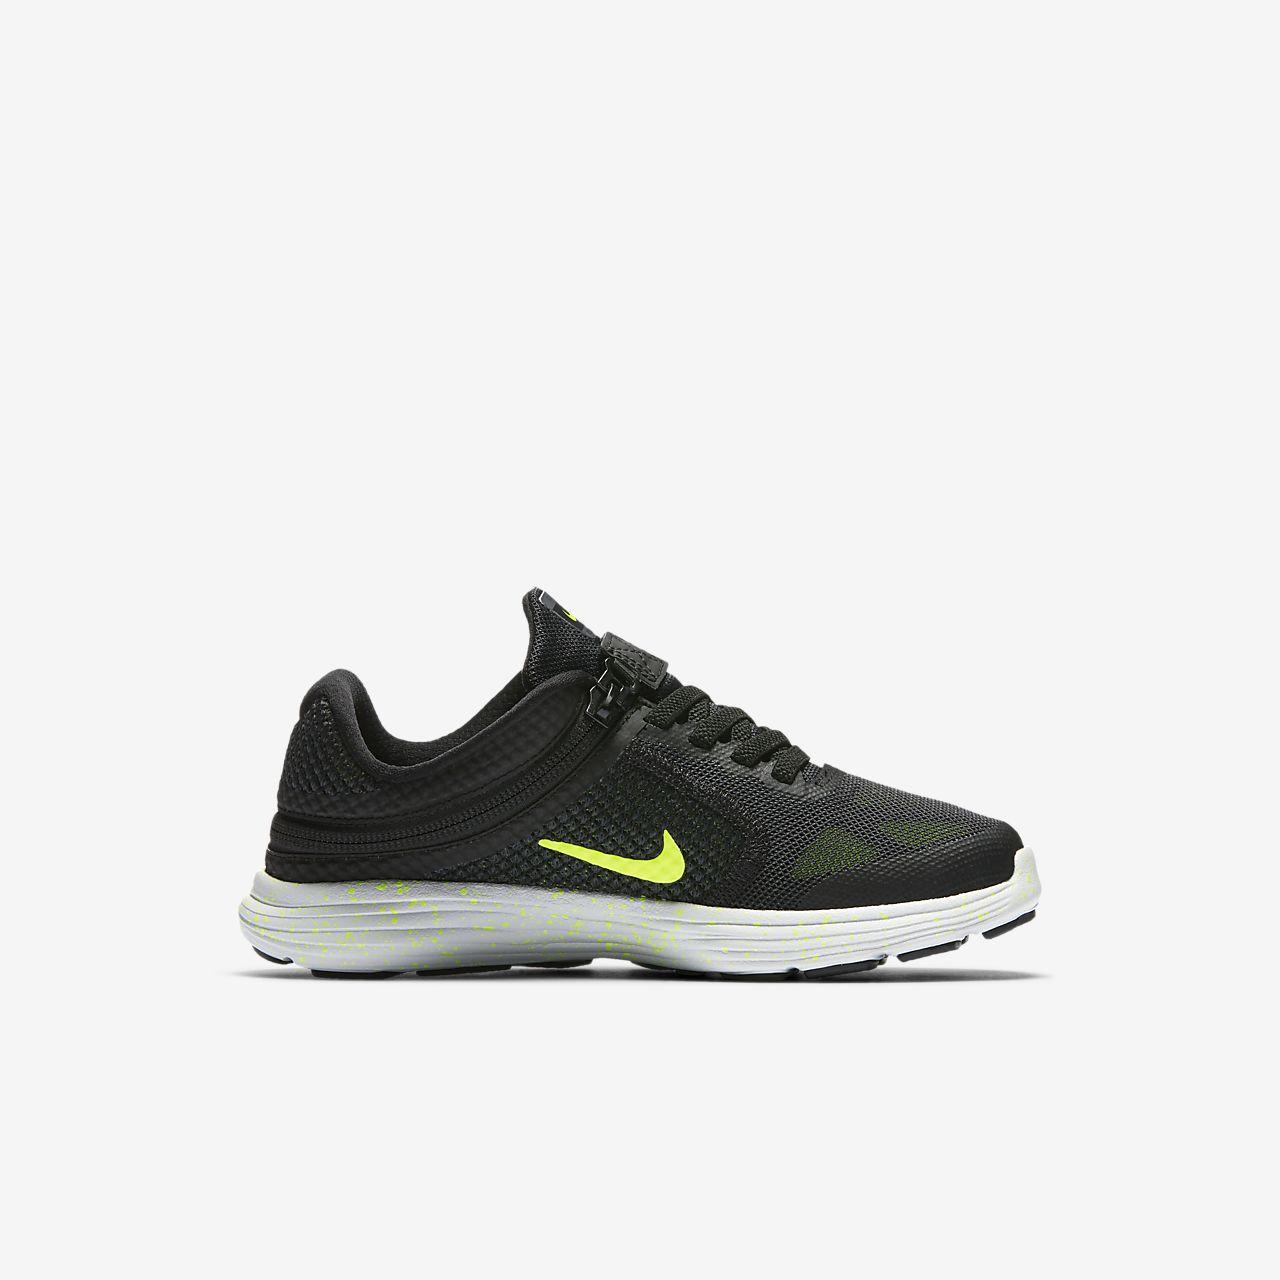 ... Nike Revolution 3 FlyEase Little Kids' Running Shoe